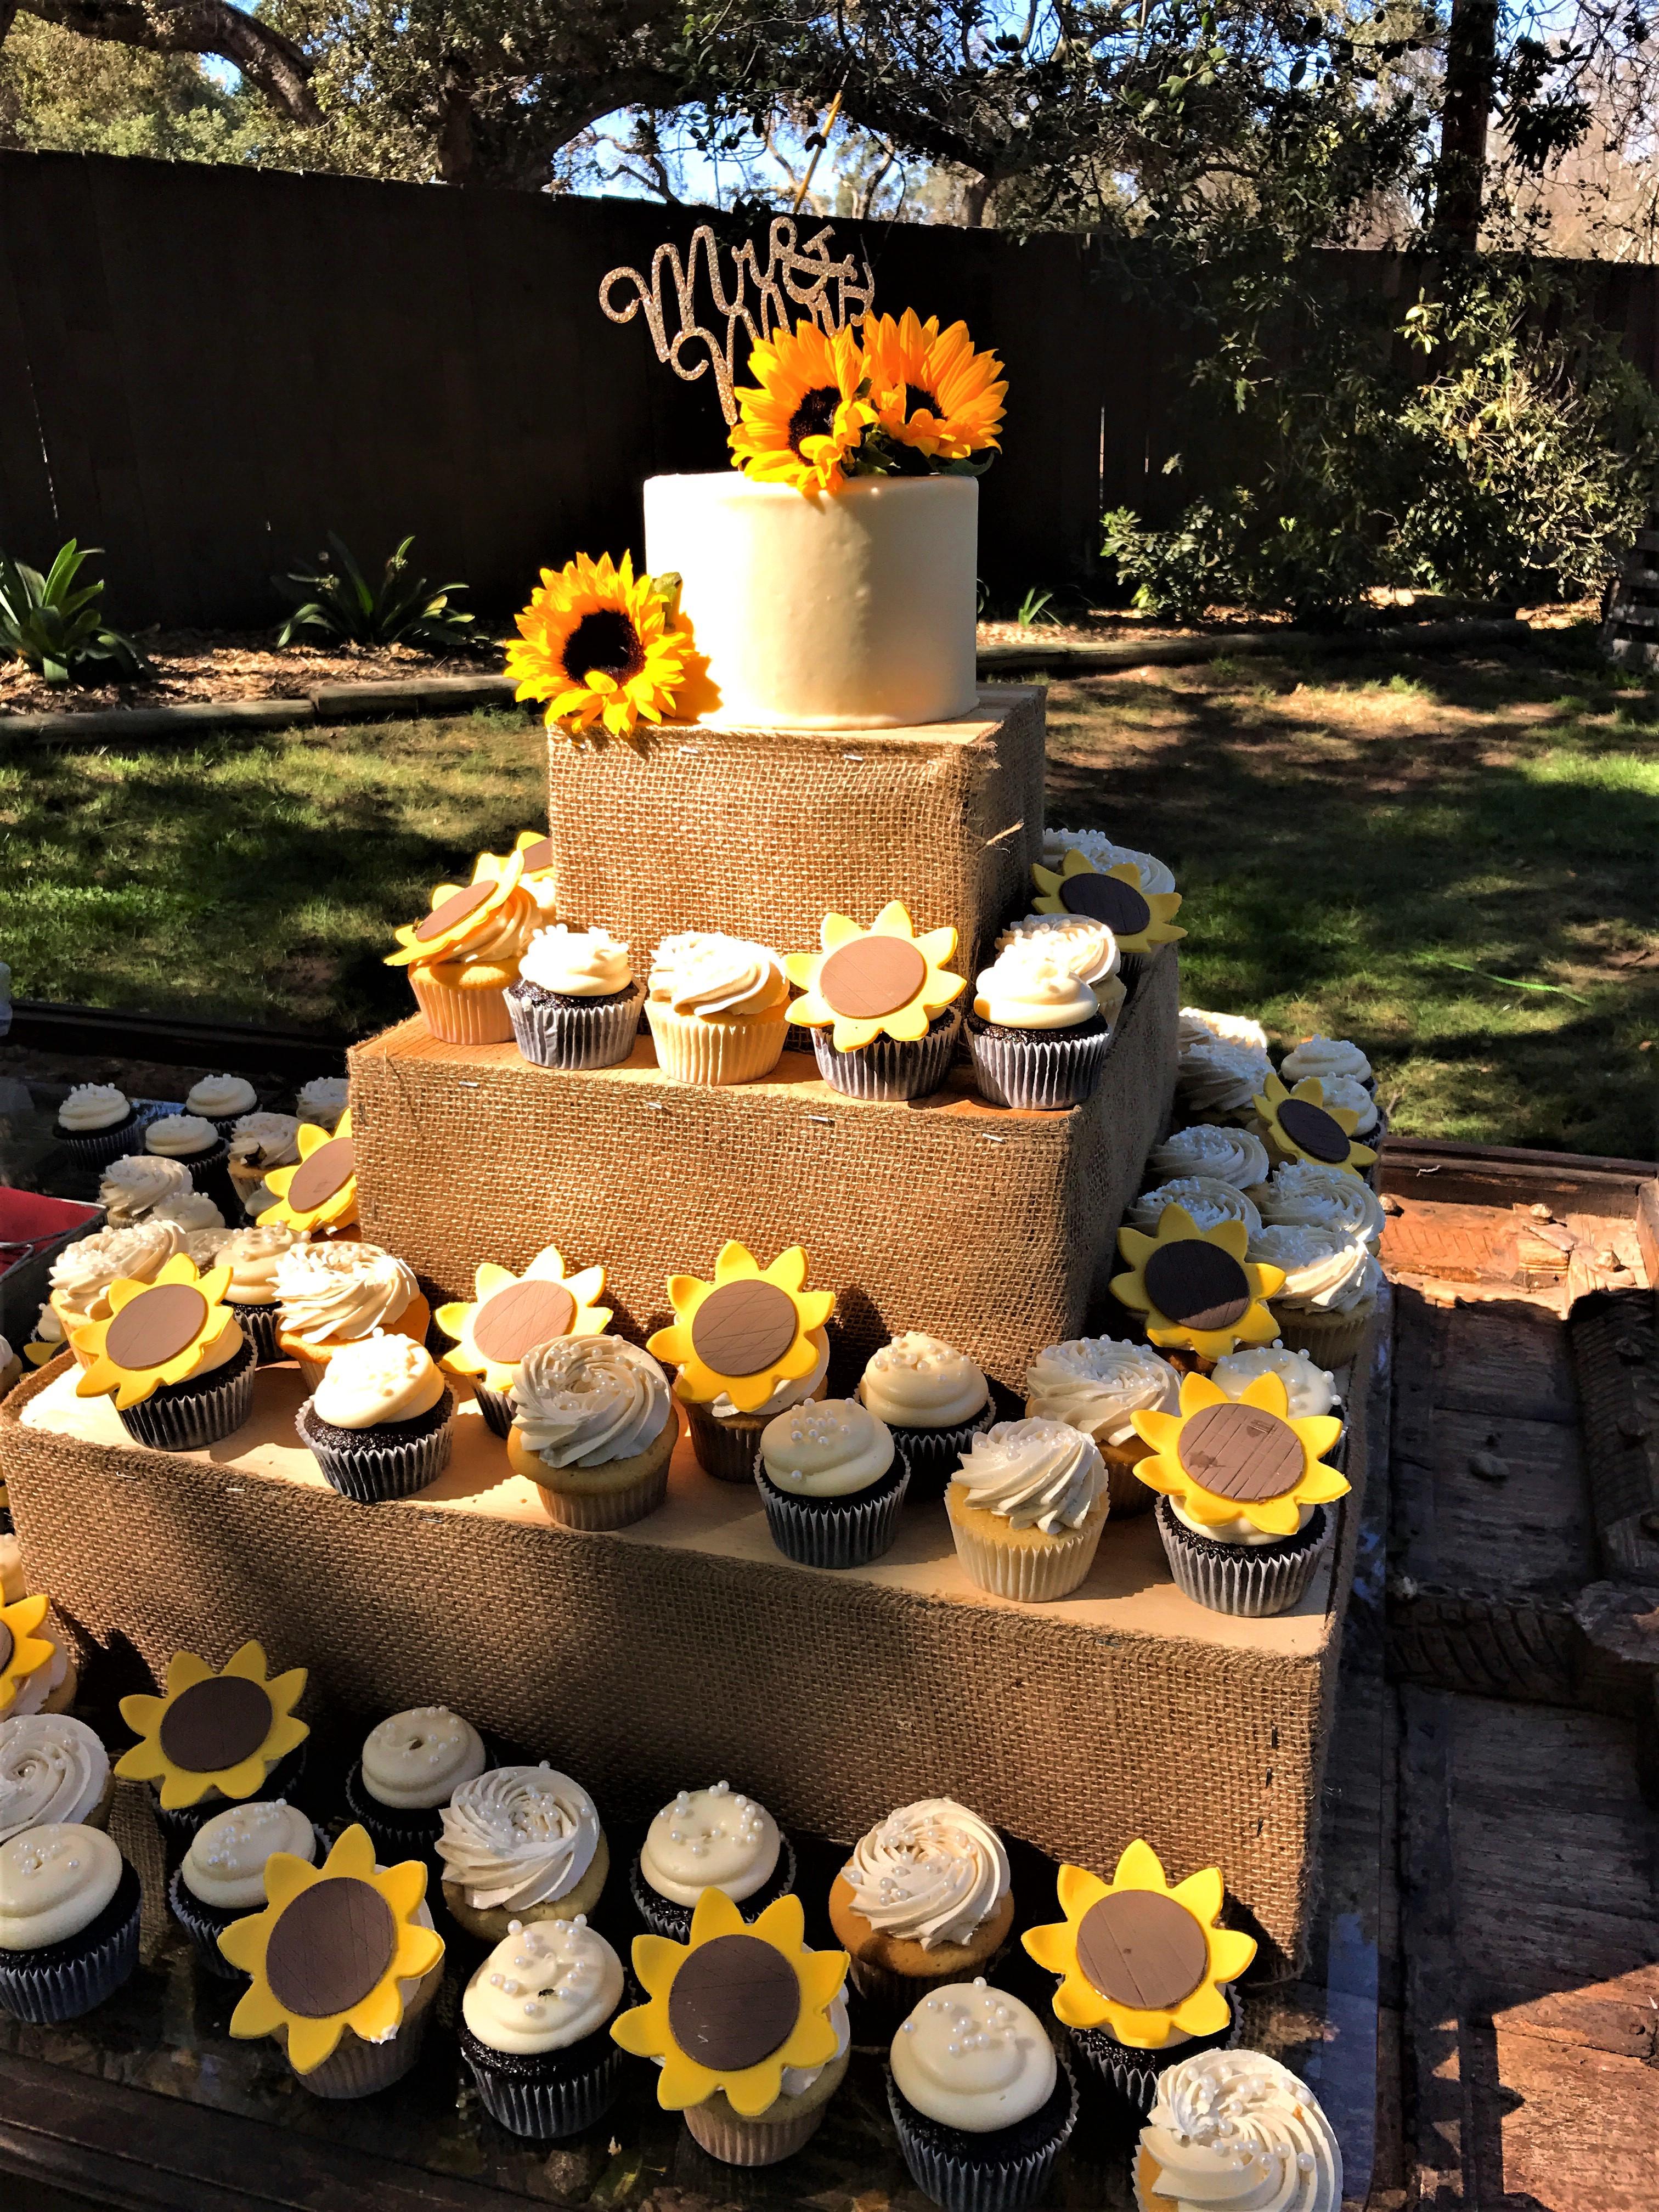 "125 cupcakes w/fondant sunflowers, 6"" classic simple cutting cake"